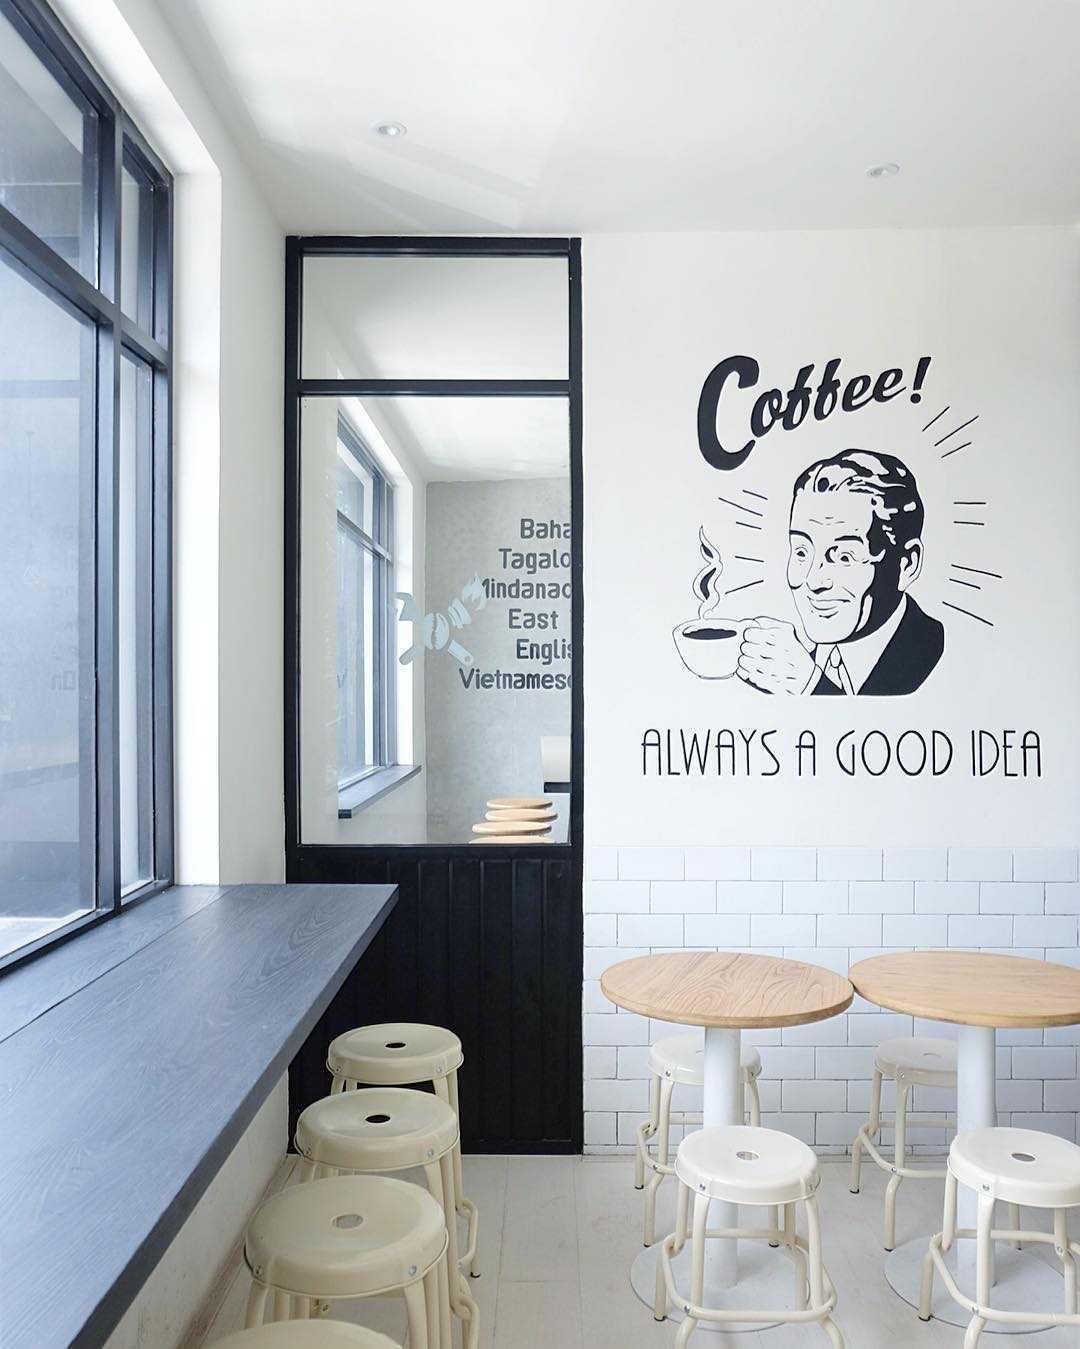 Soseki Design Studio Viverri Coffee Shop Muara Angke Muara Angke Seating Area Modern,skandinavia  22398